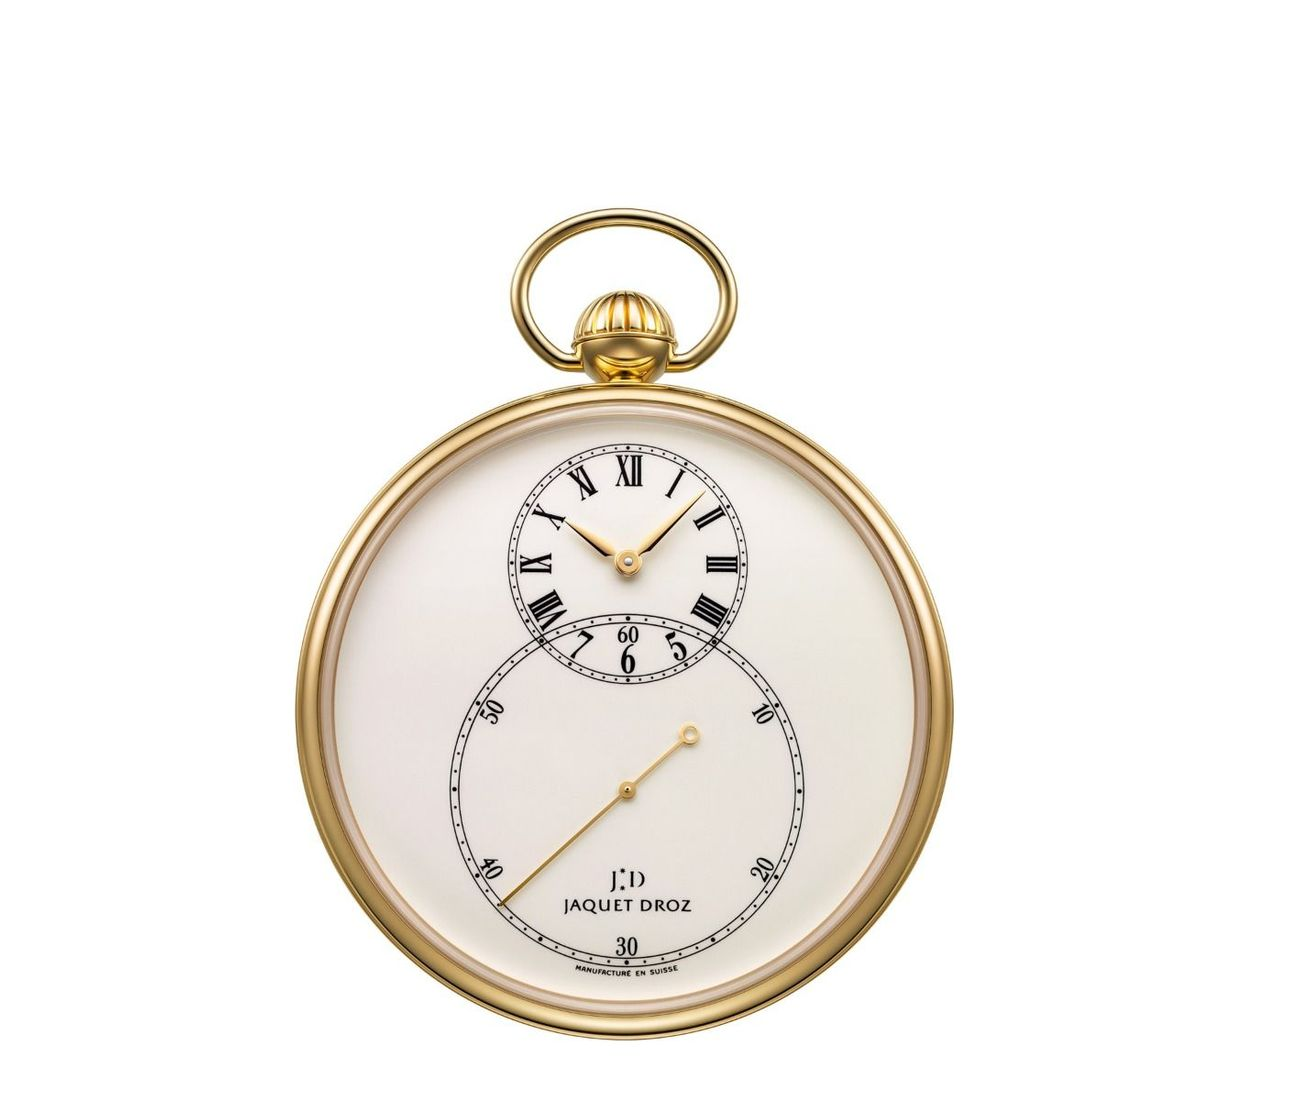 The Pocket Watch Ivory Enamel